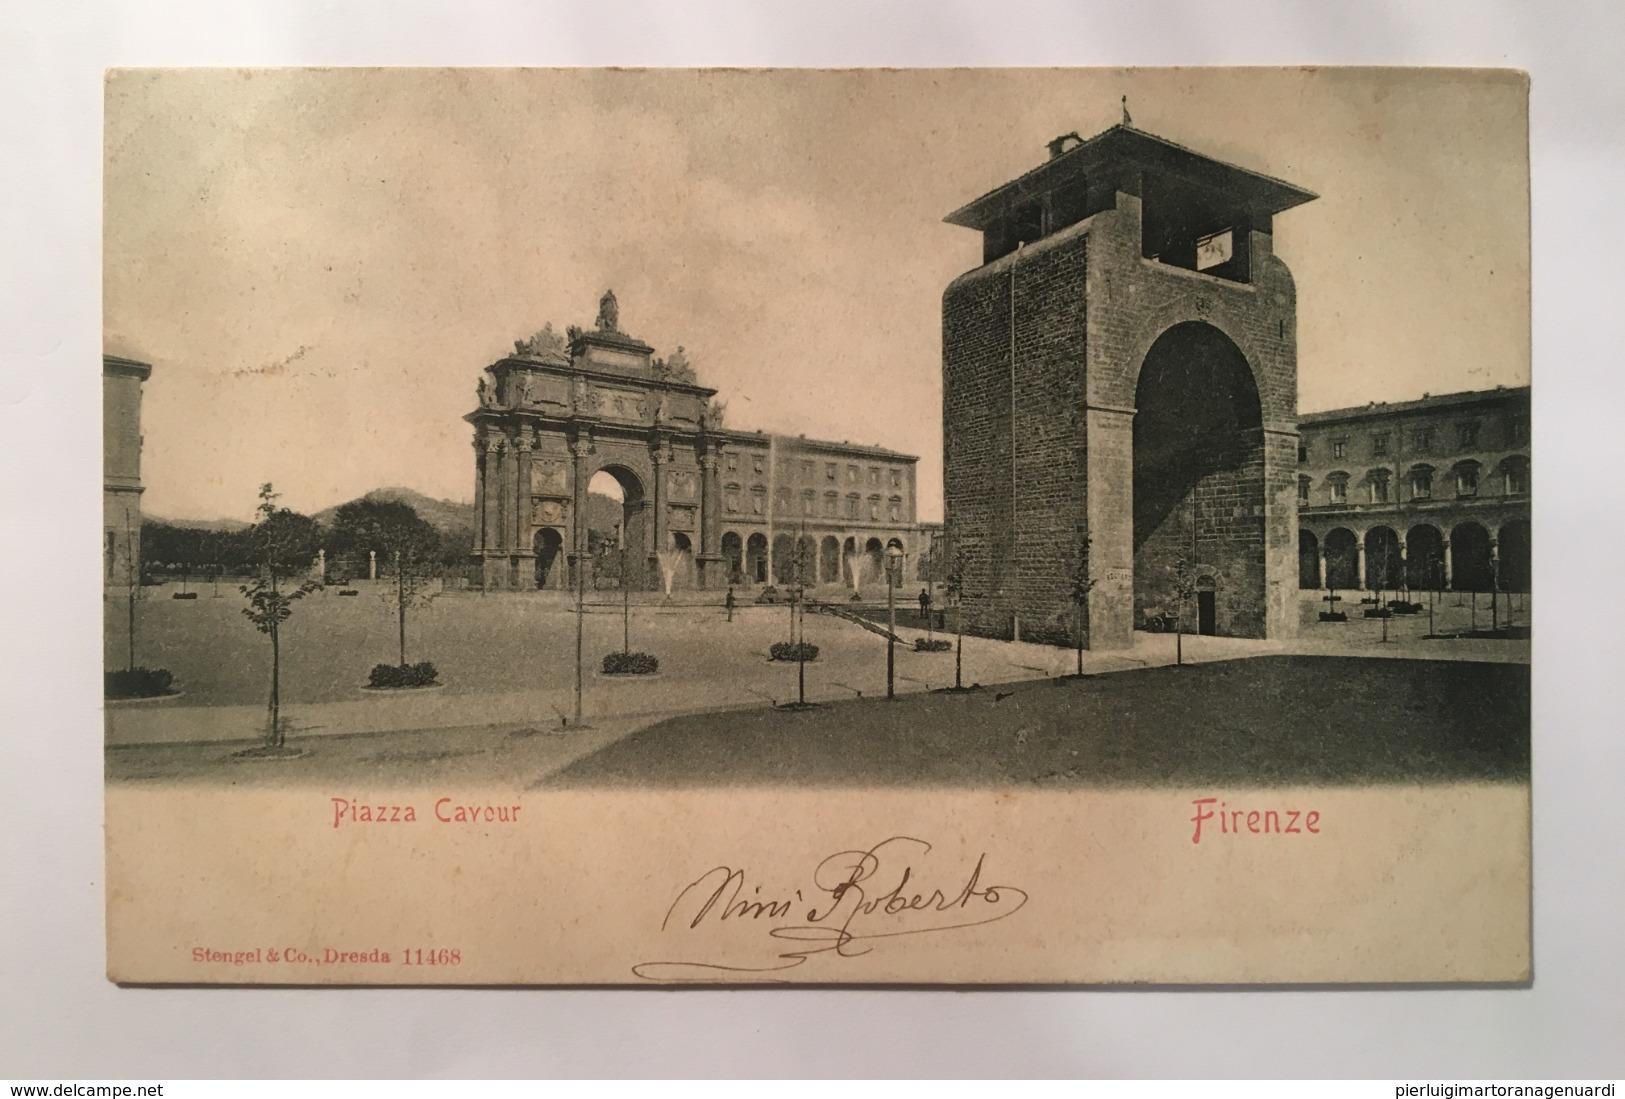 V 11042 Firenze - Piazza Cavour - Firenze